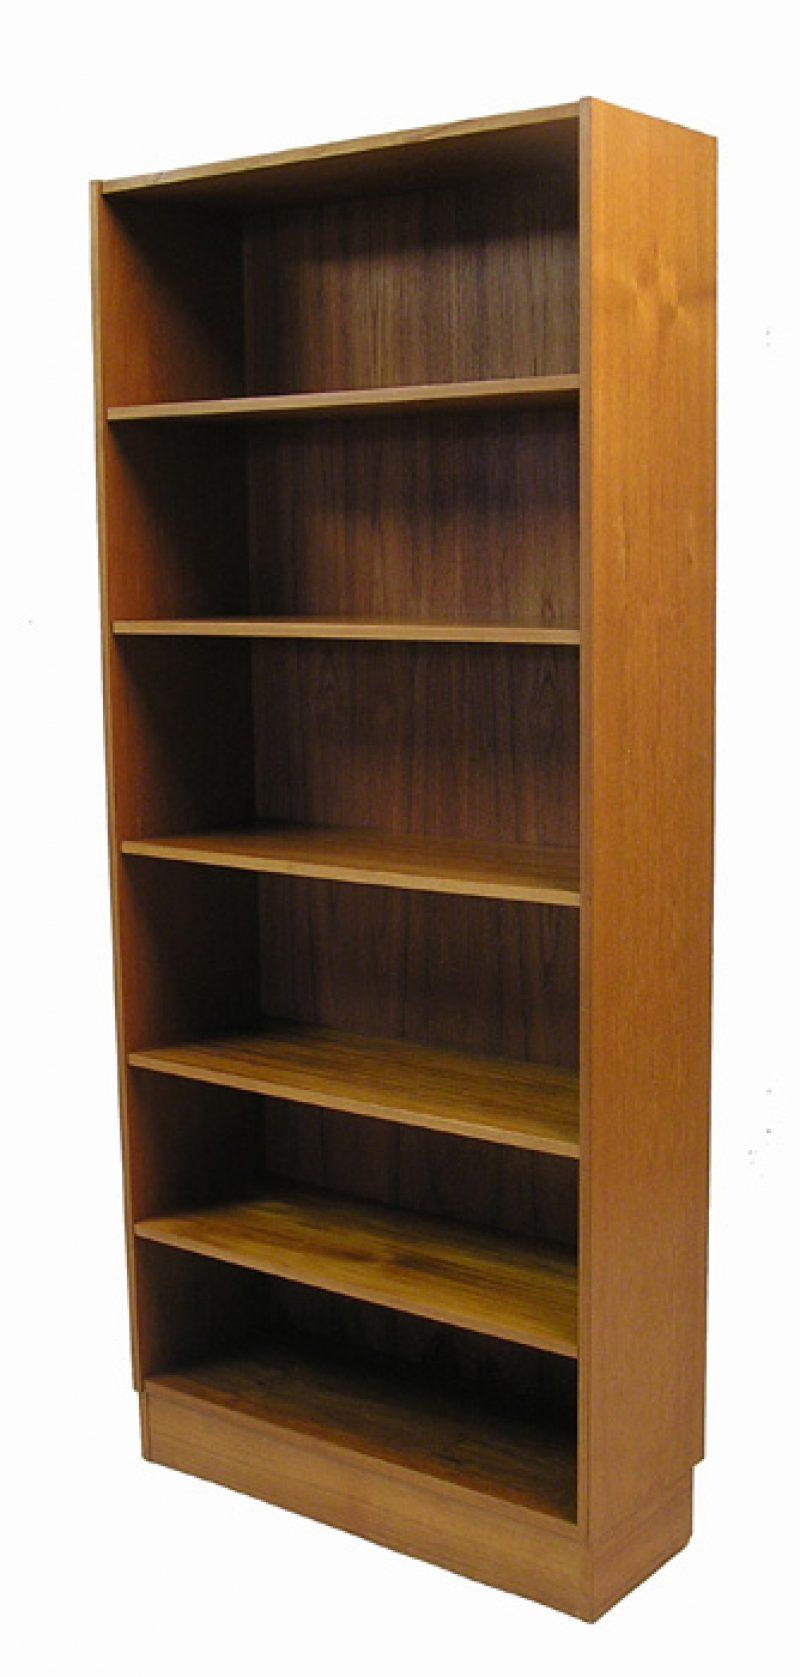 1970s Tall Teak Bookshelf *2 Available*